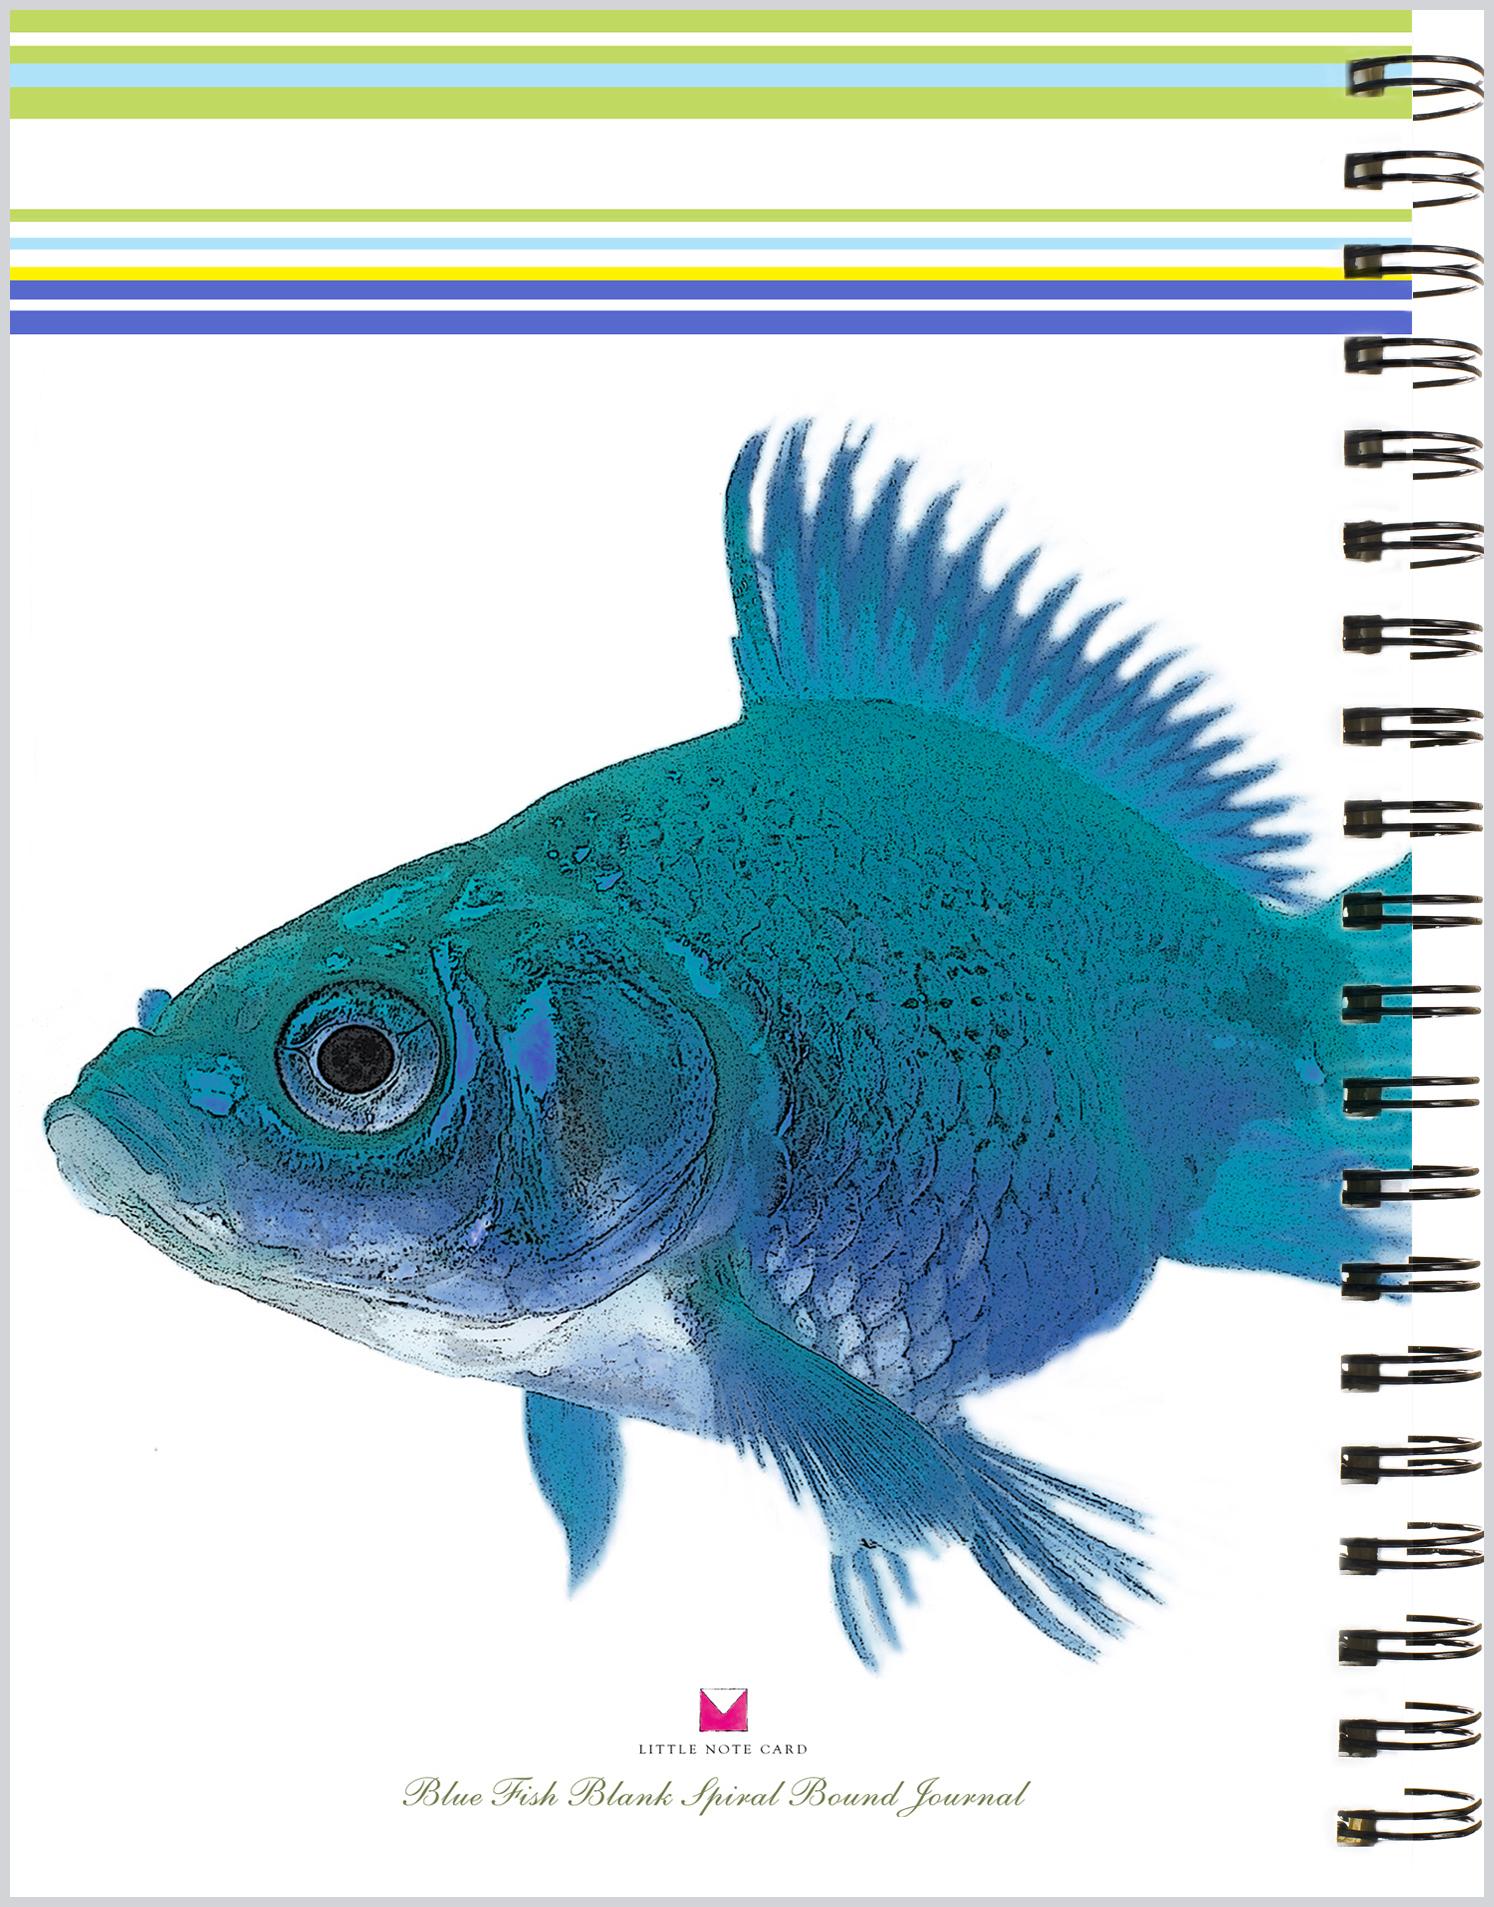 LittleNoteCard_BlueFish_BlankJournal